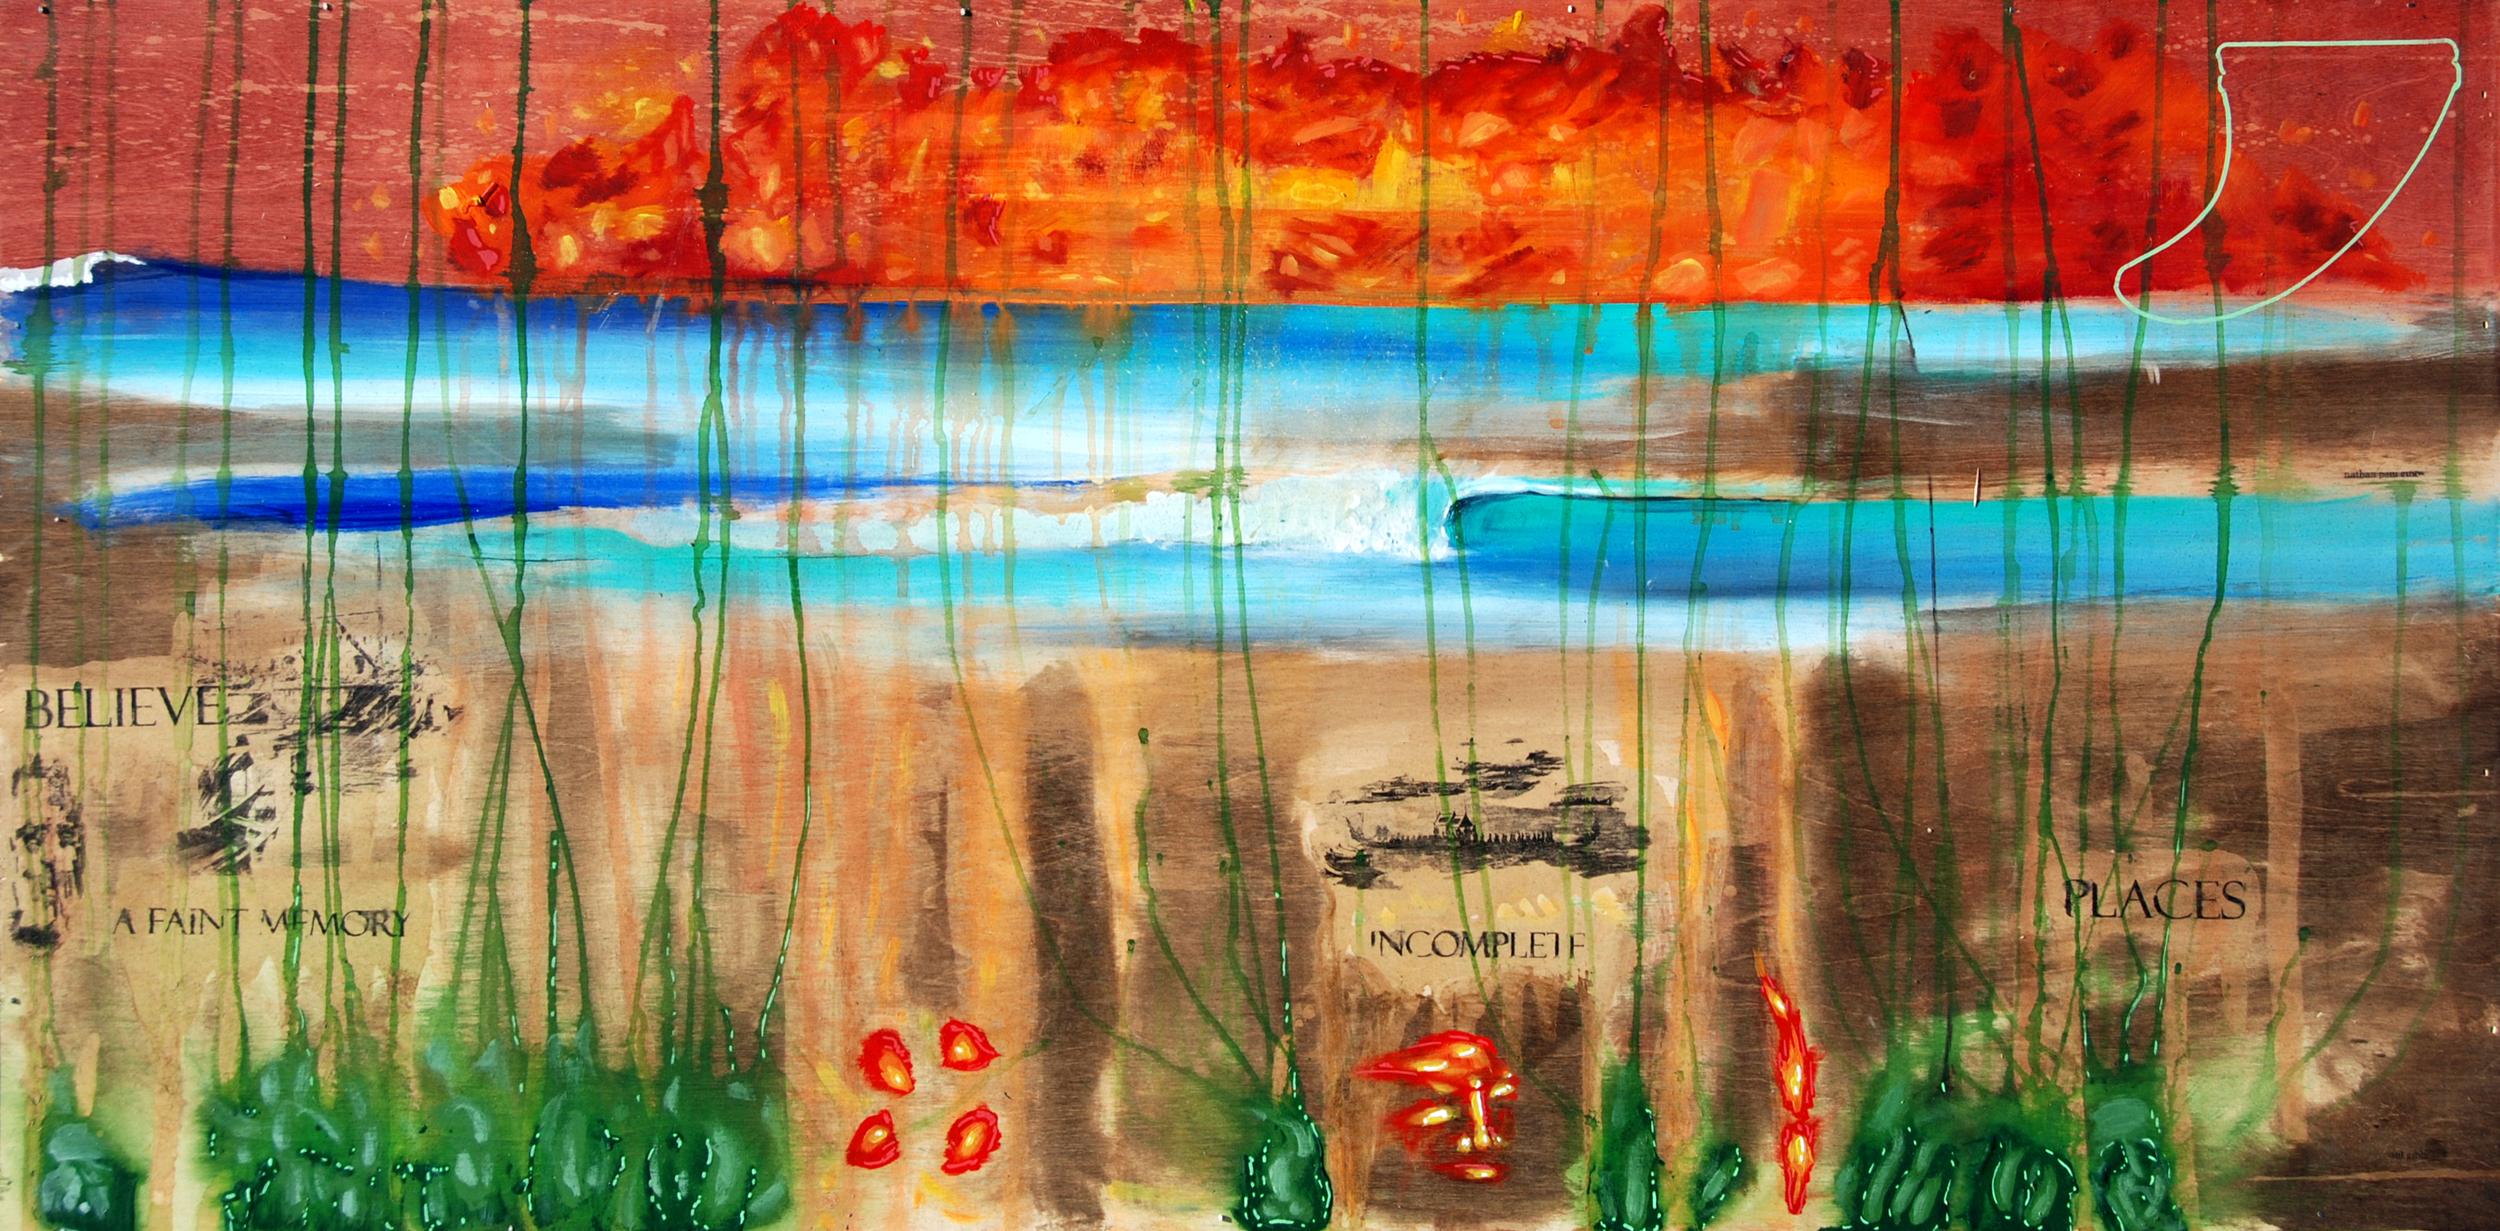 Believe a faint memory incomplete places surf art.jpg